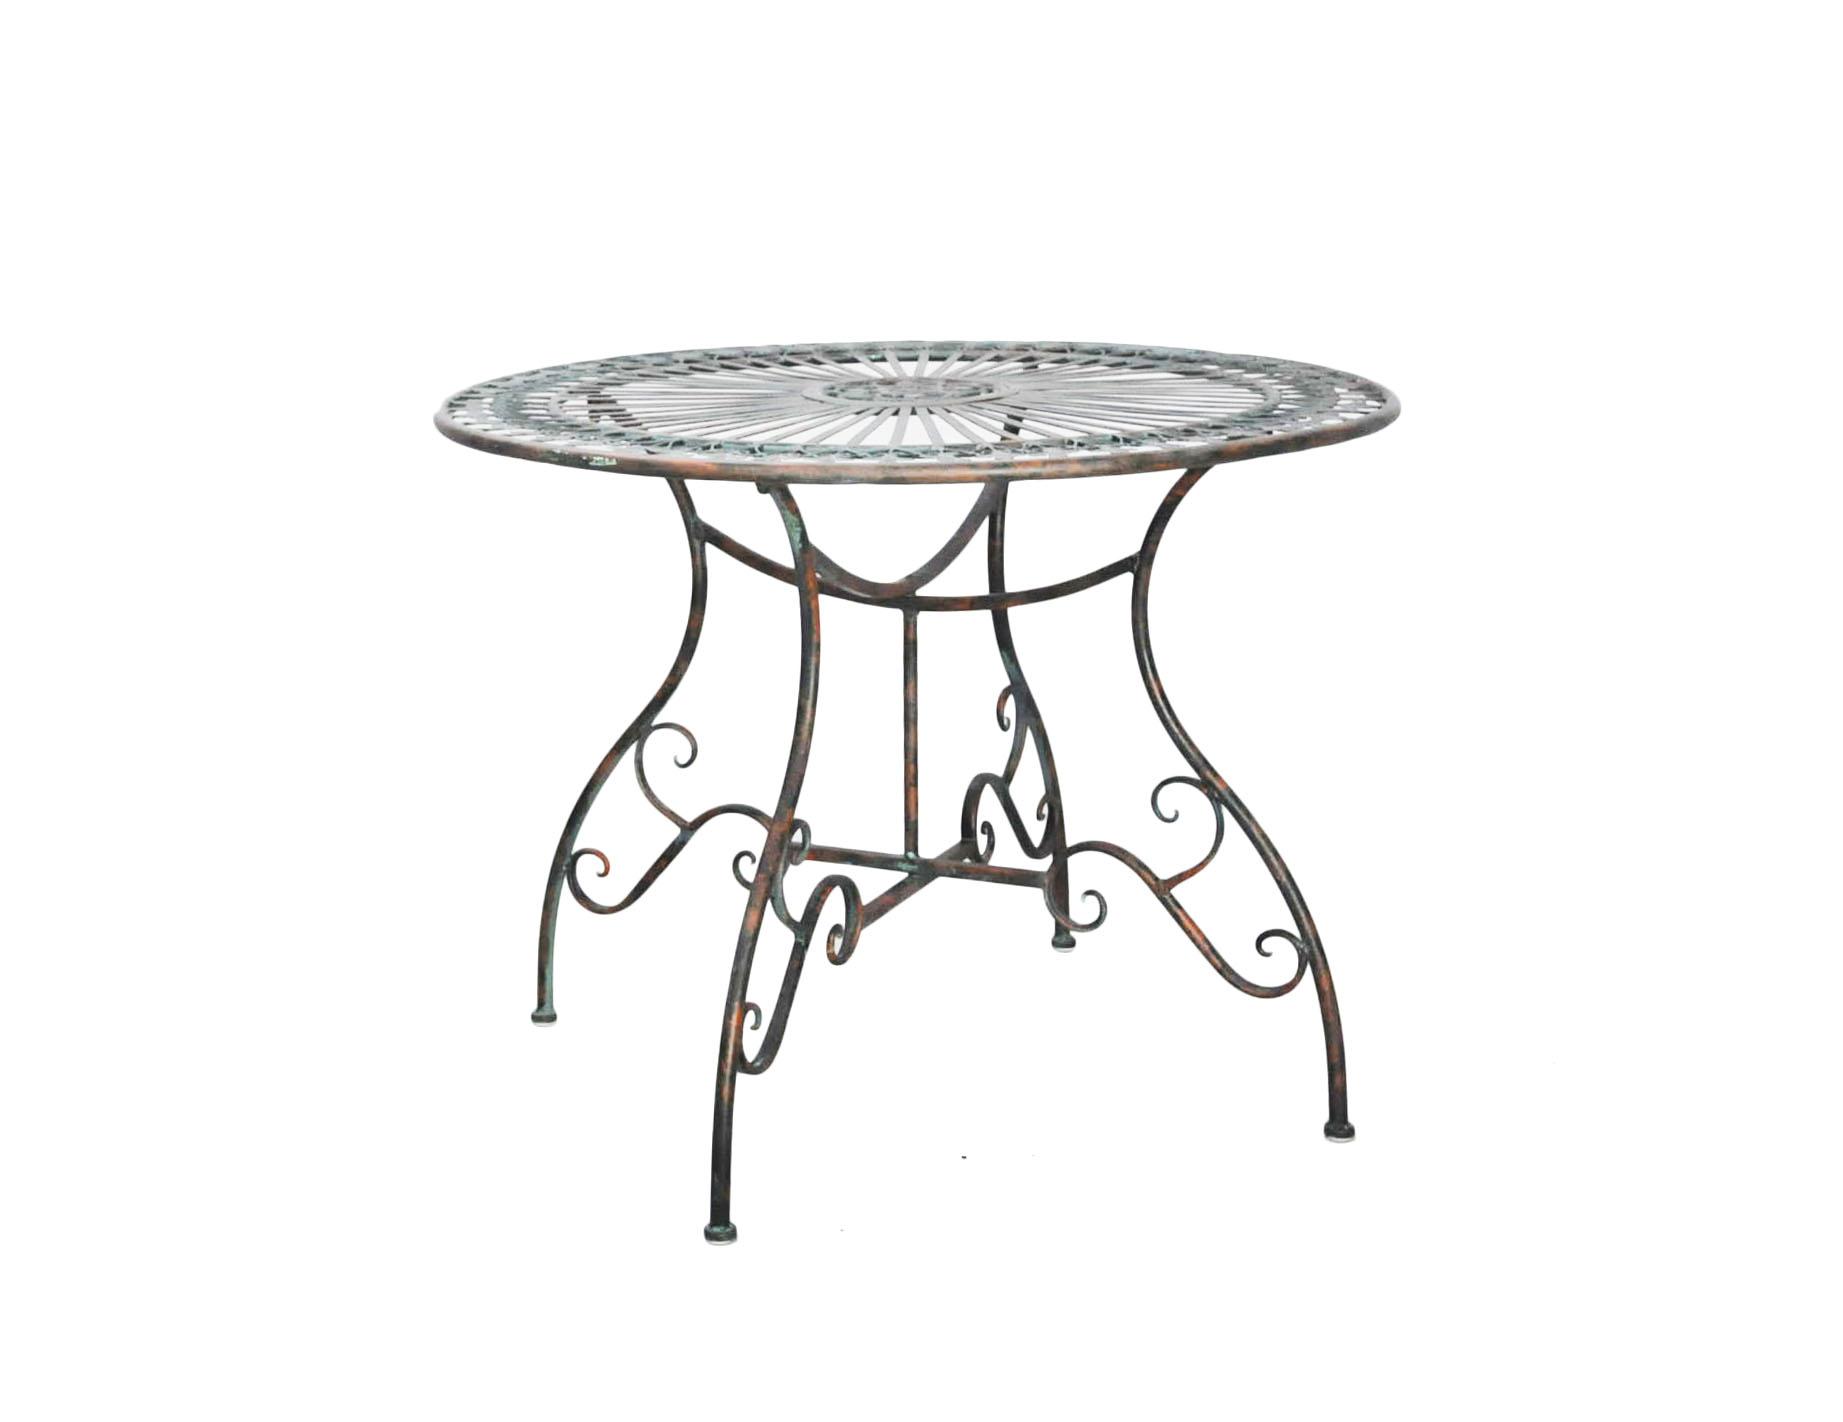 belle table ronde en fer forge vert de gris